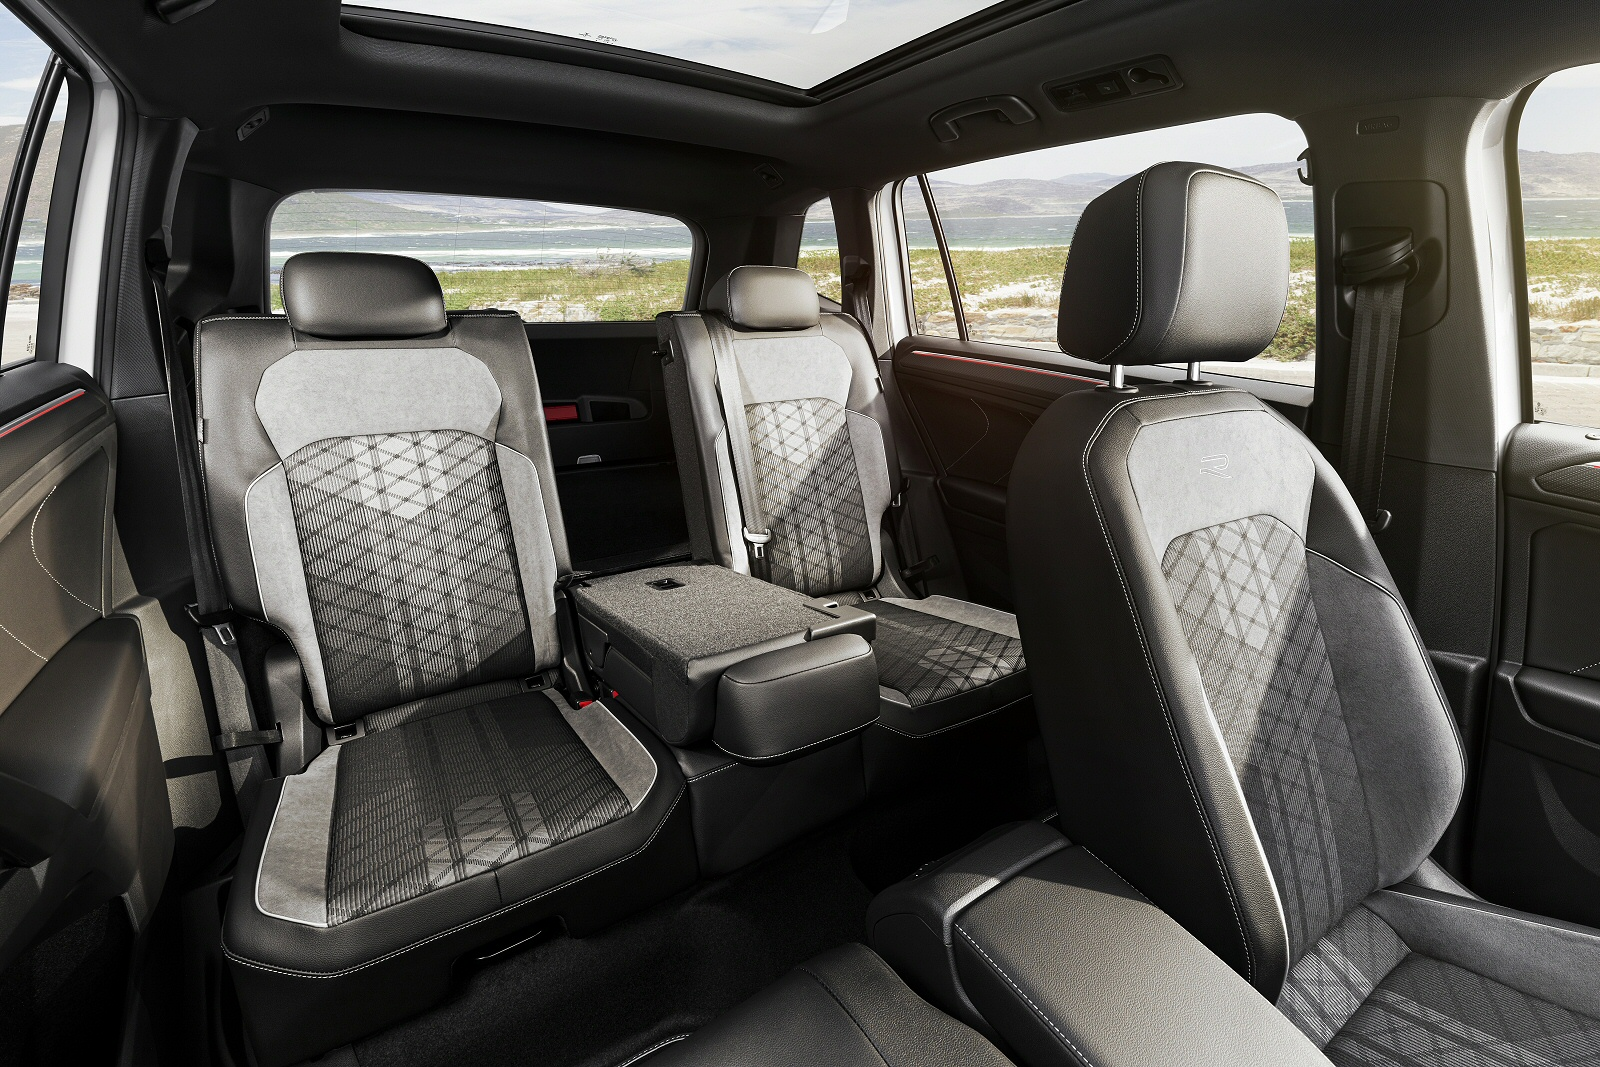 Volkswagen TIGUAN ALLSPACE 2.0 TDI Match 5dr DSG